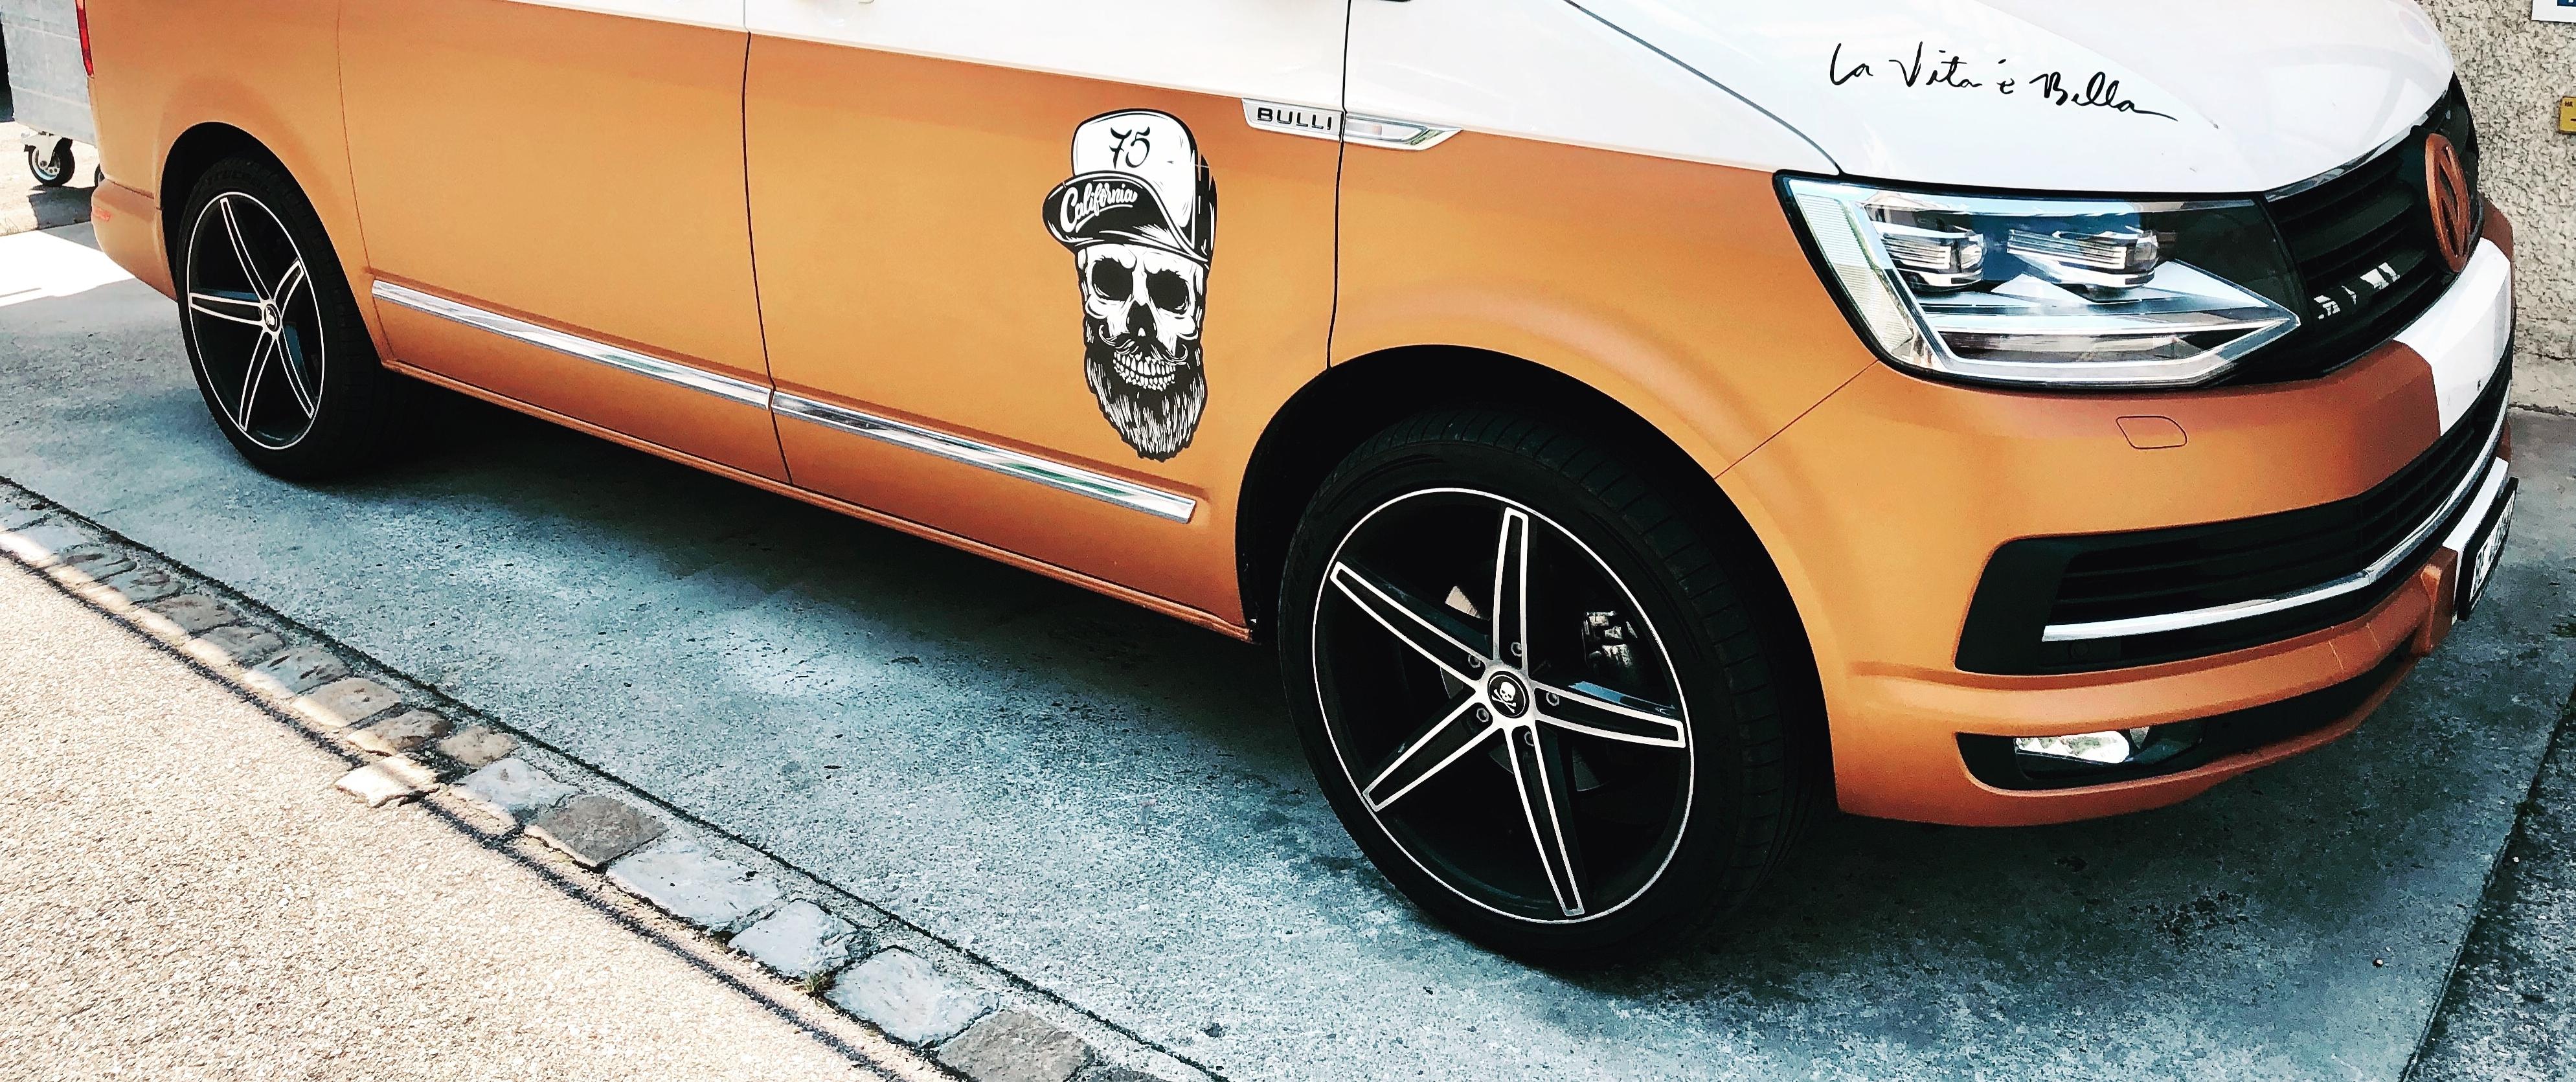 VW – T6 California – Speziallack – OXIGIN – 18 Concave – Schwarz – 20 Zoll